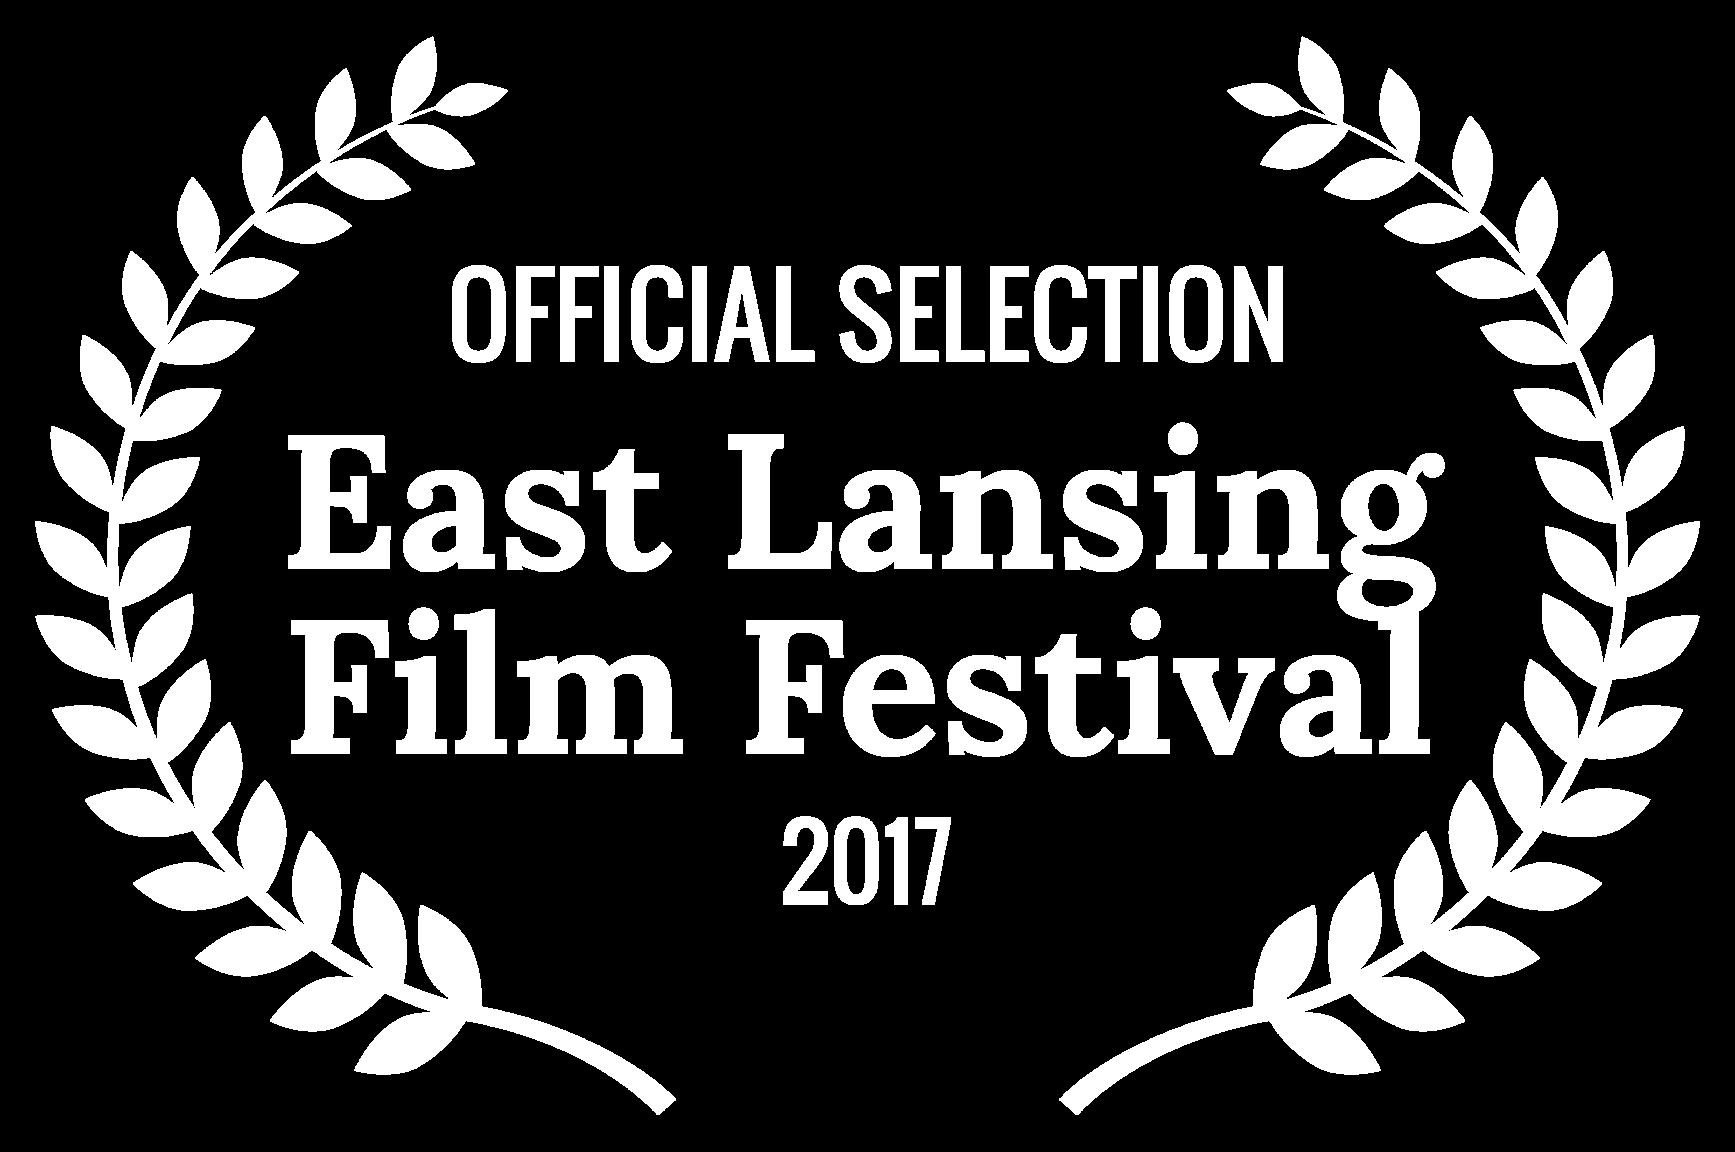 OFFICIAL SELECTION - East Lansing Film Festival 2 - 2017.png